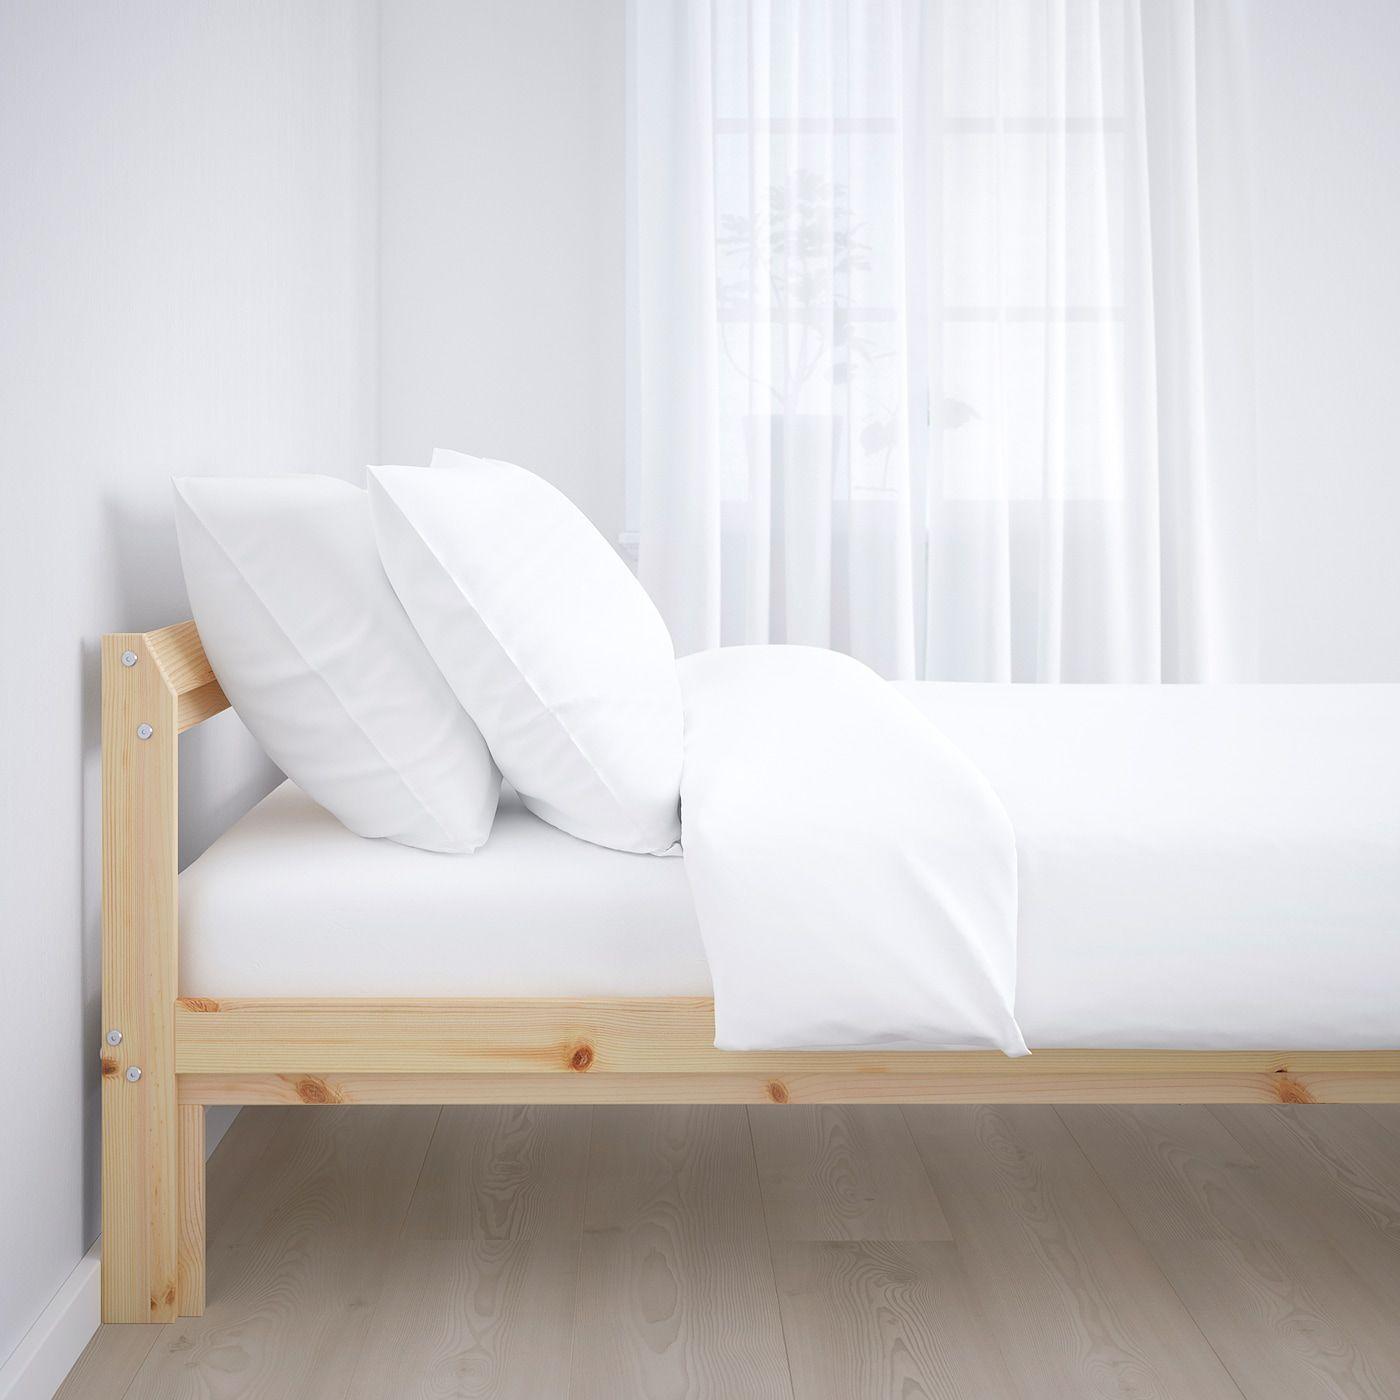 Neiden Bed Frame Pine Birch Luroy Full En 2020 Cadre De Lit Lit Rangement Tete De Lit Inclinee